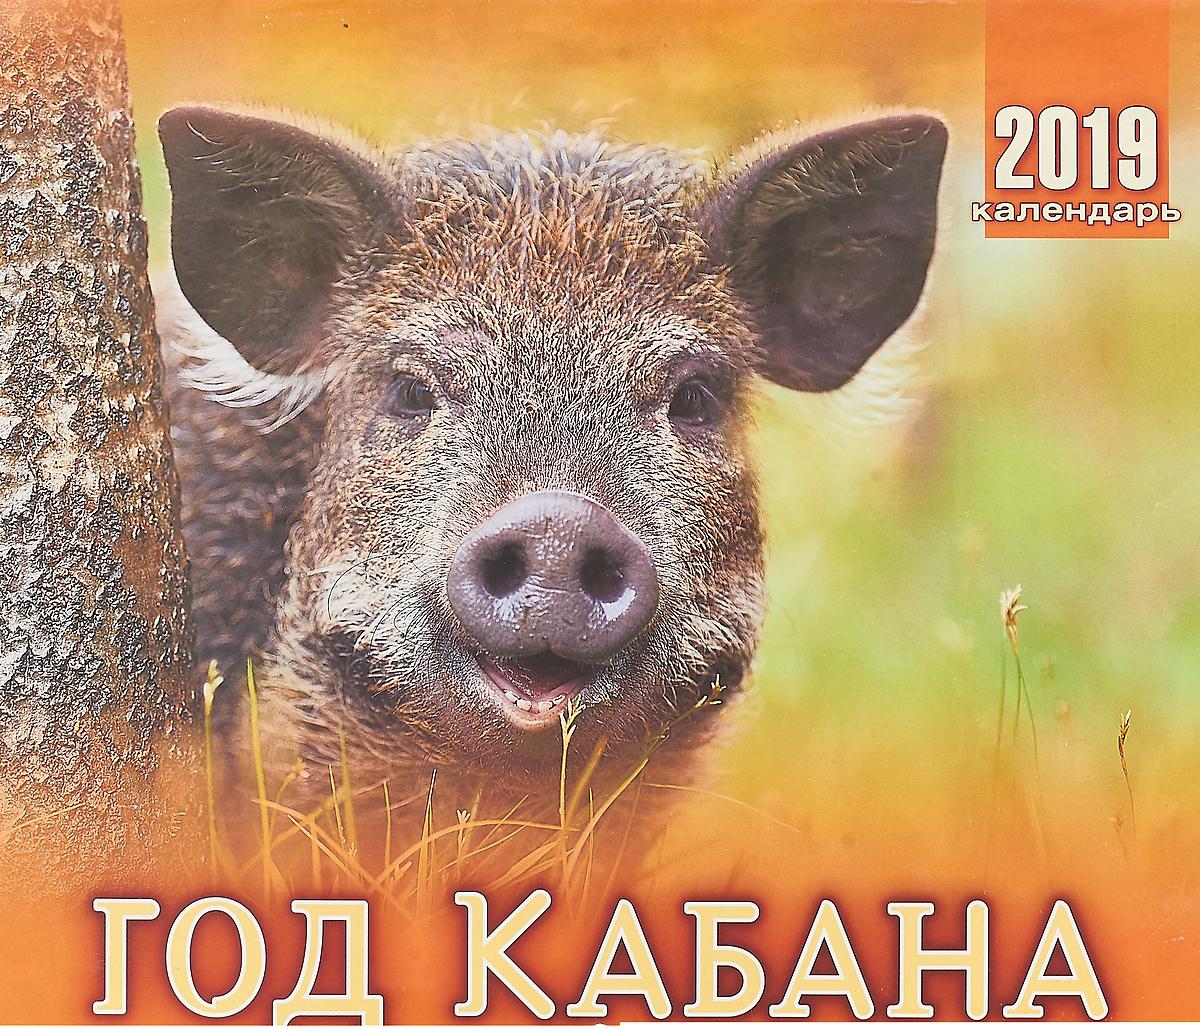 Календарь. 2019 г. Перекидной. 33х29. год кабана пк 08 ключница домик охотника 33х29